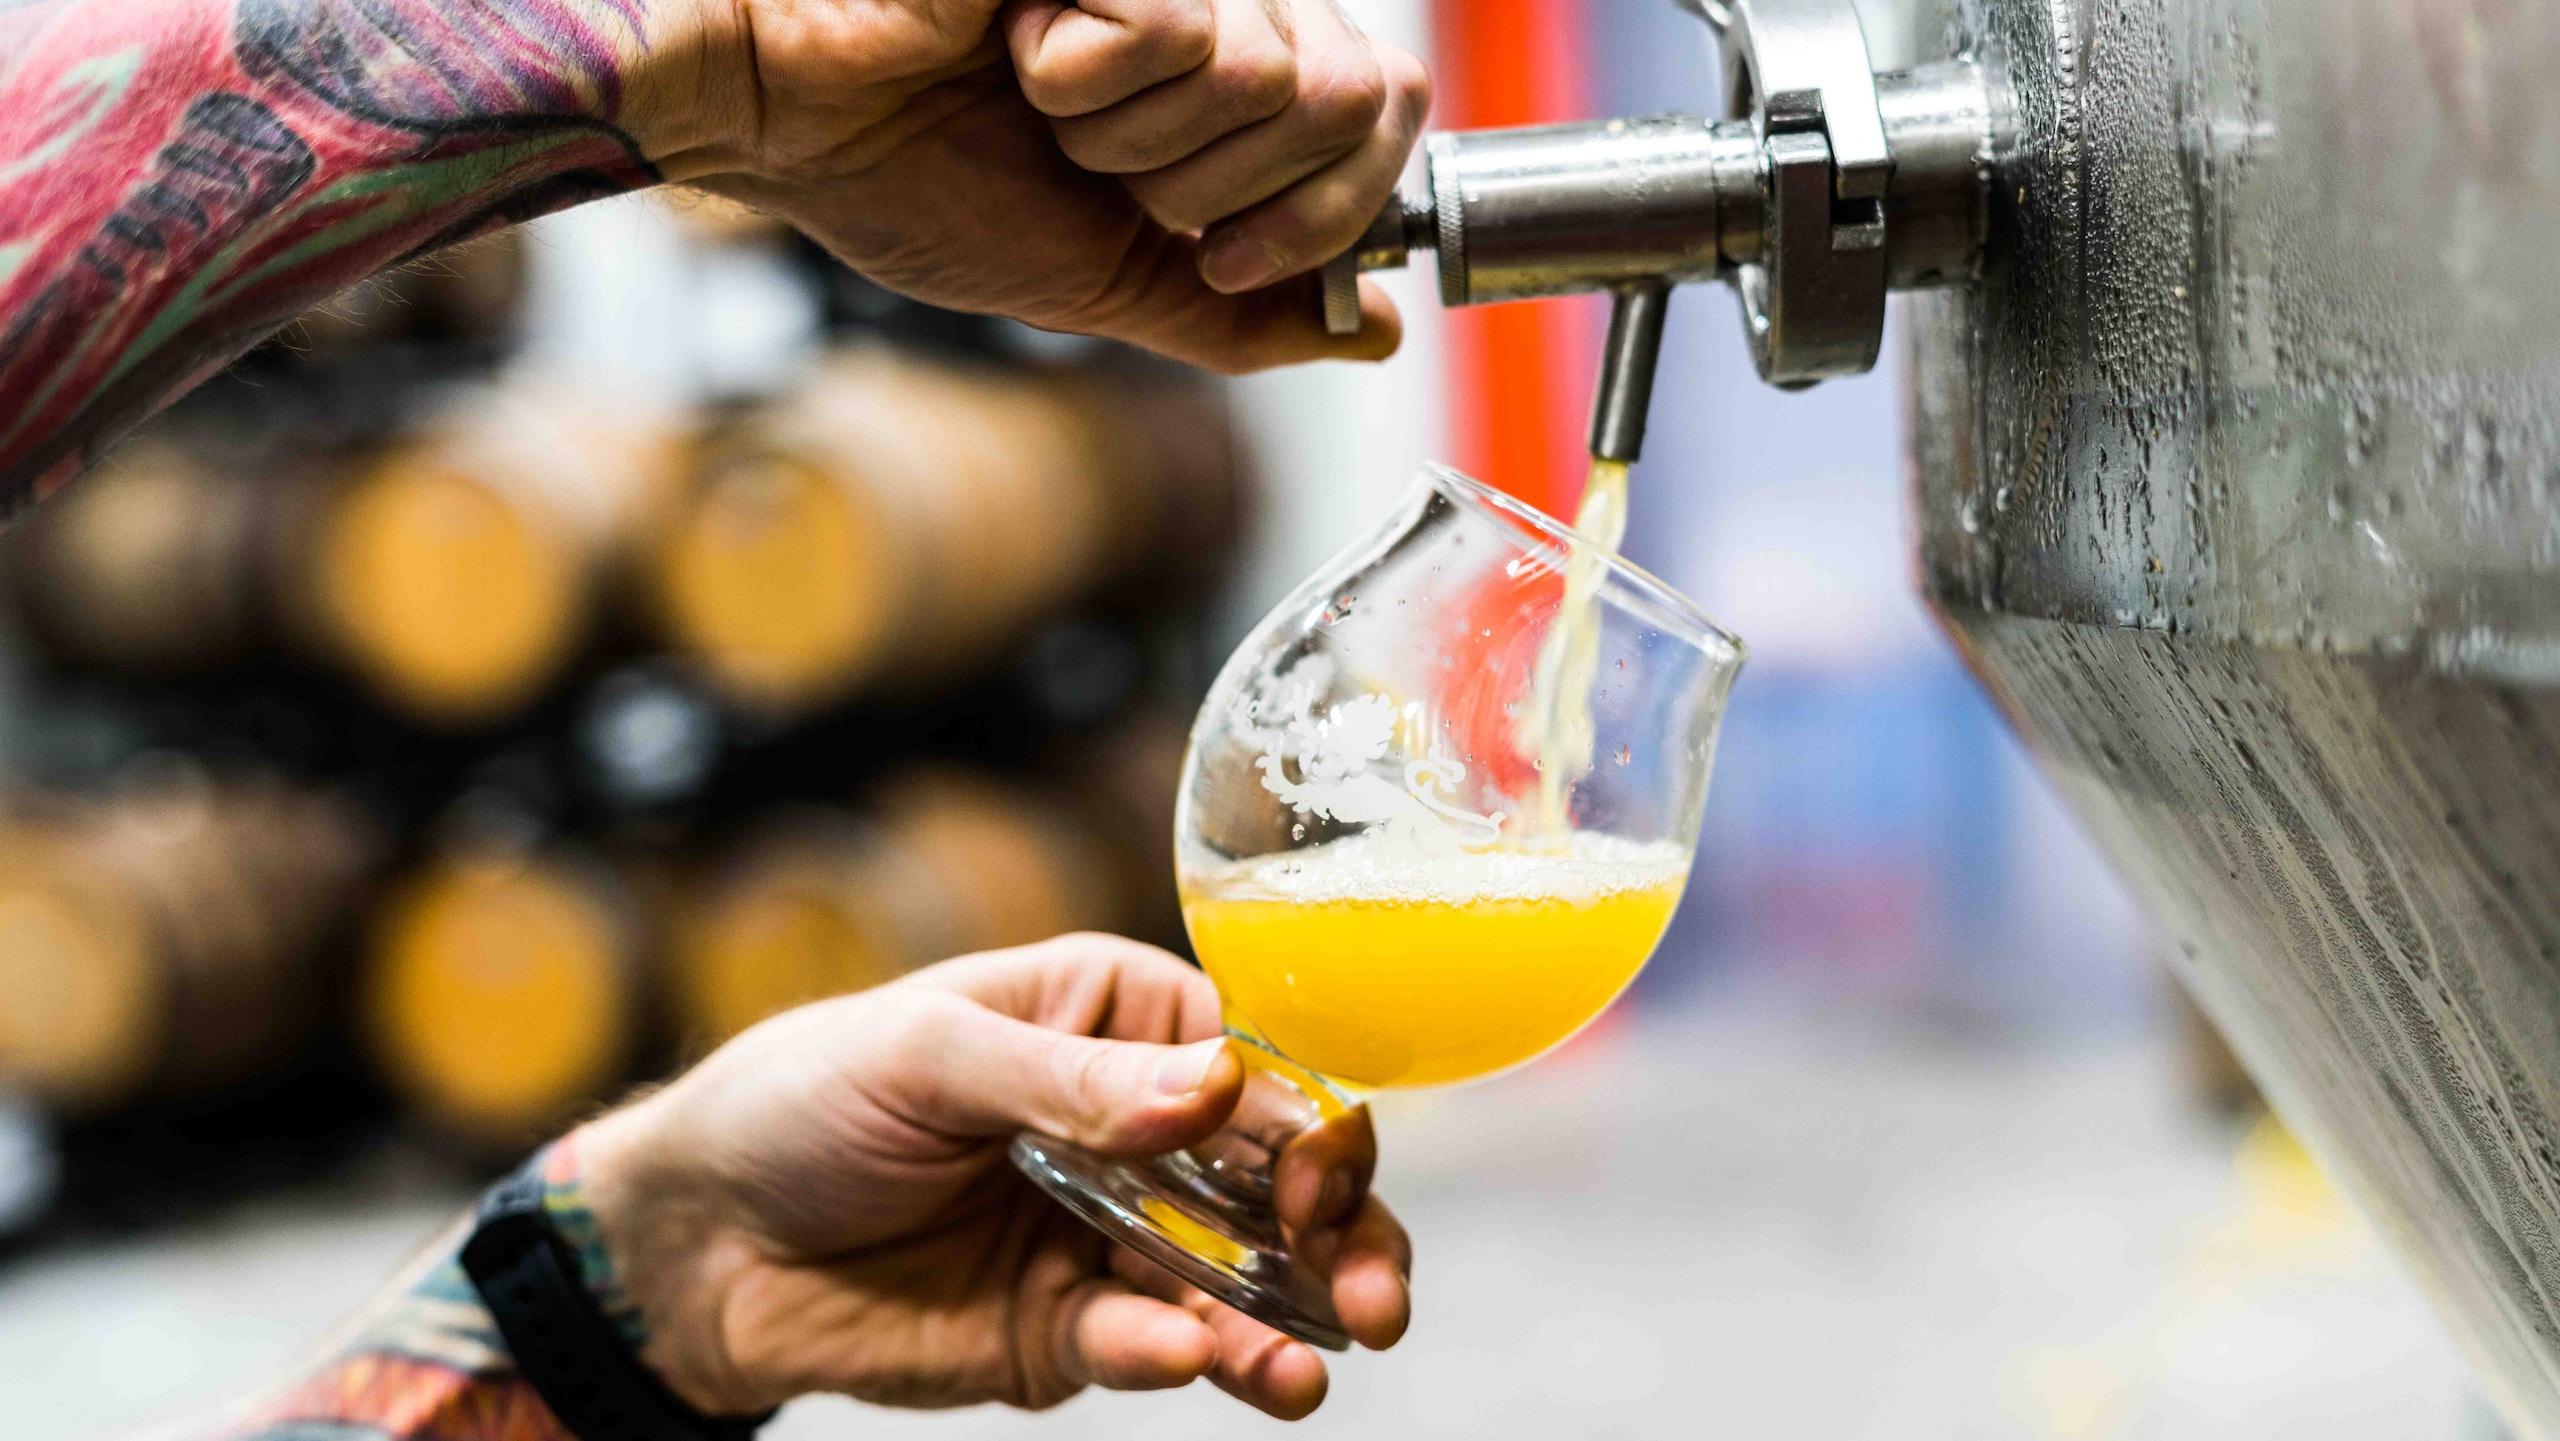 cervezas artesanales vs cervezas industriales